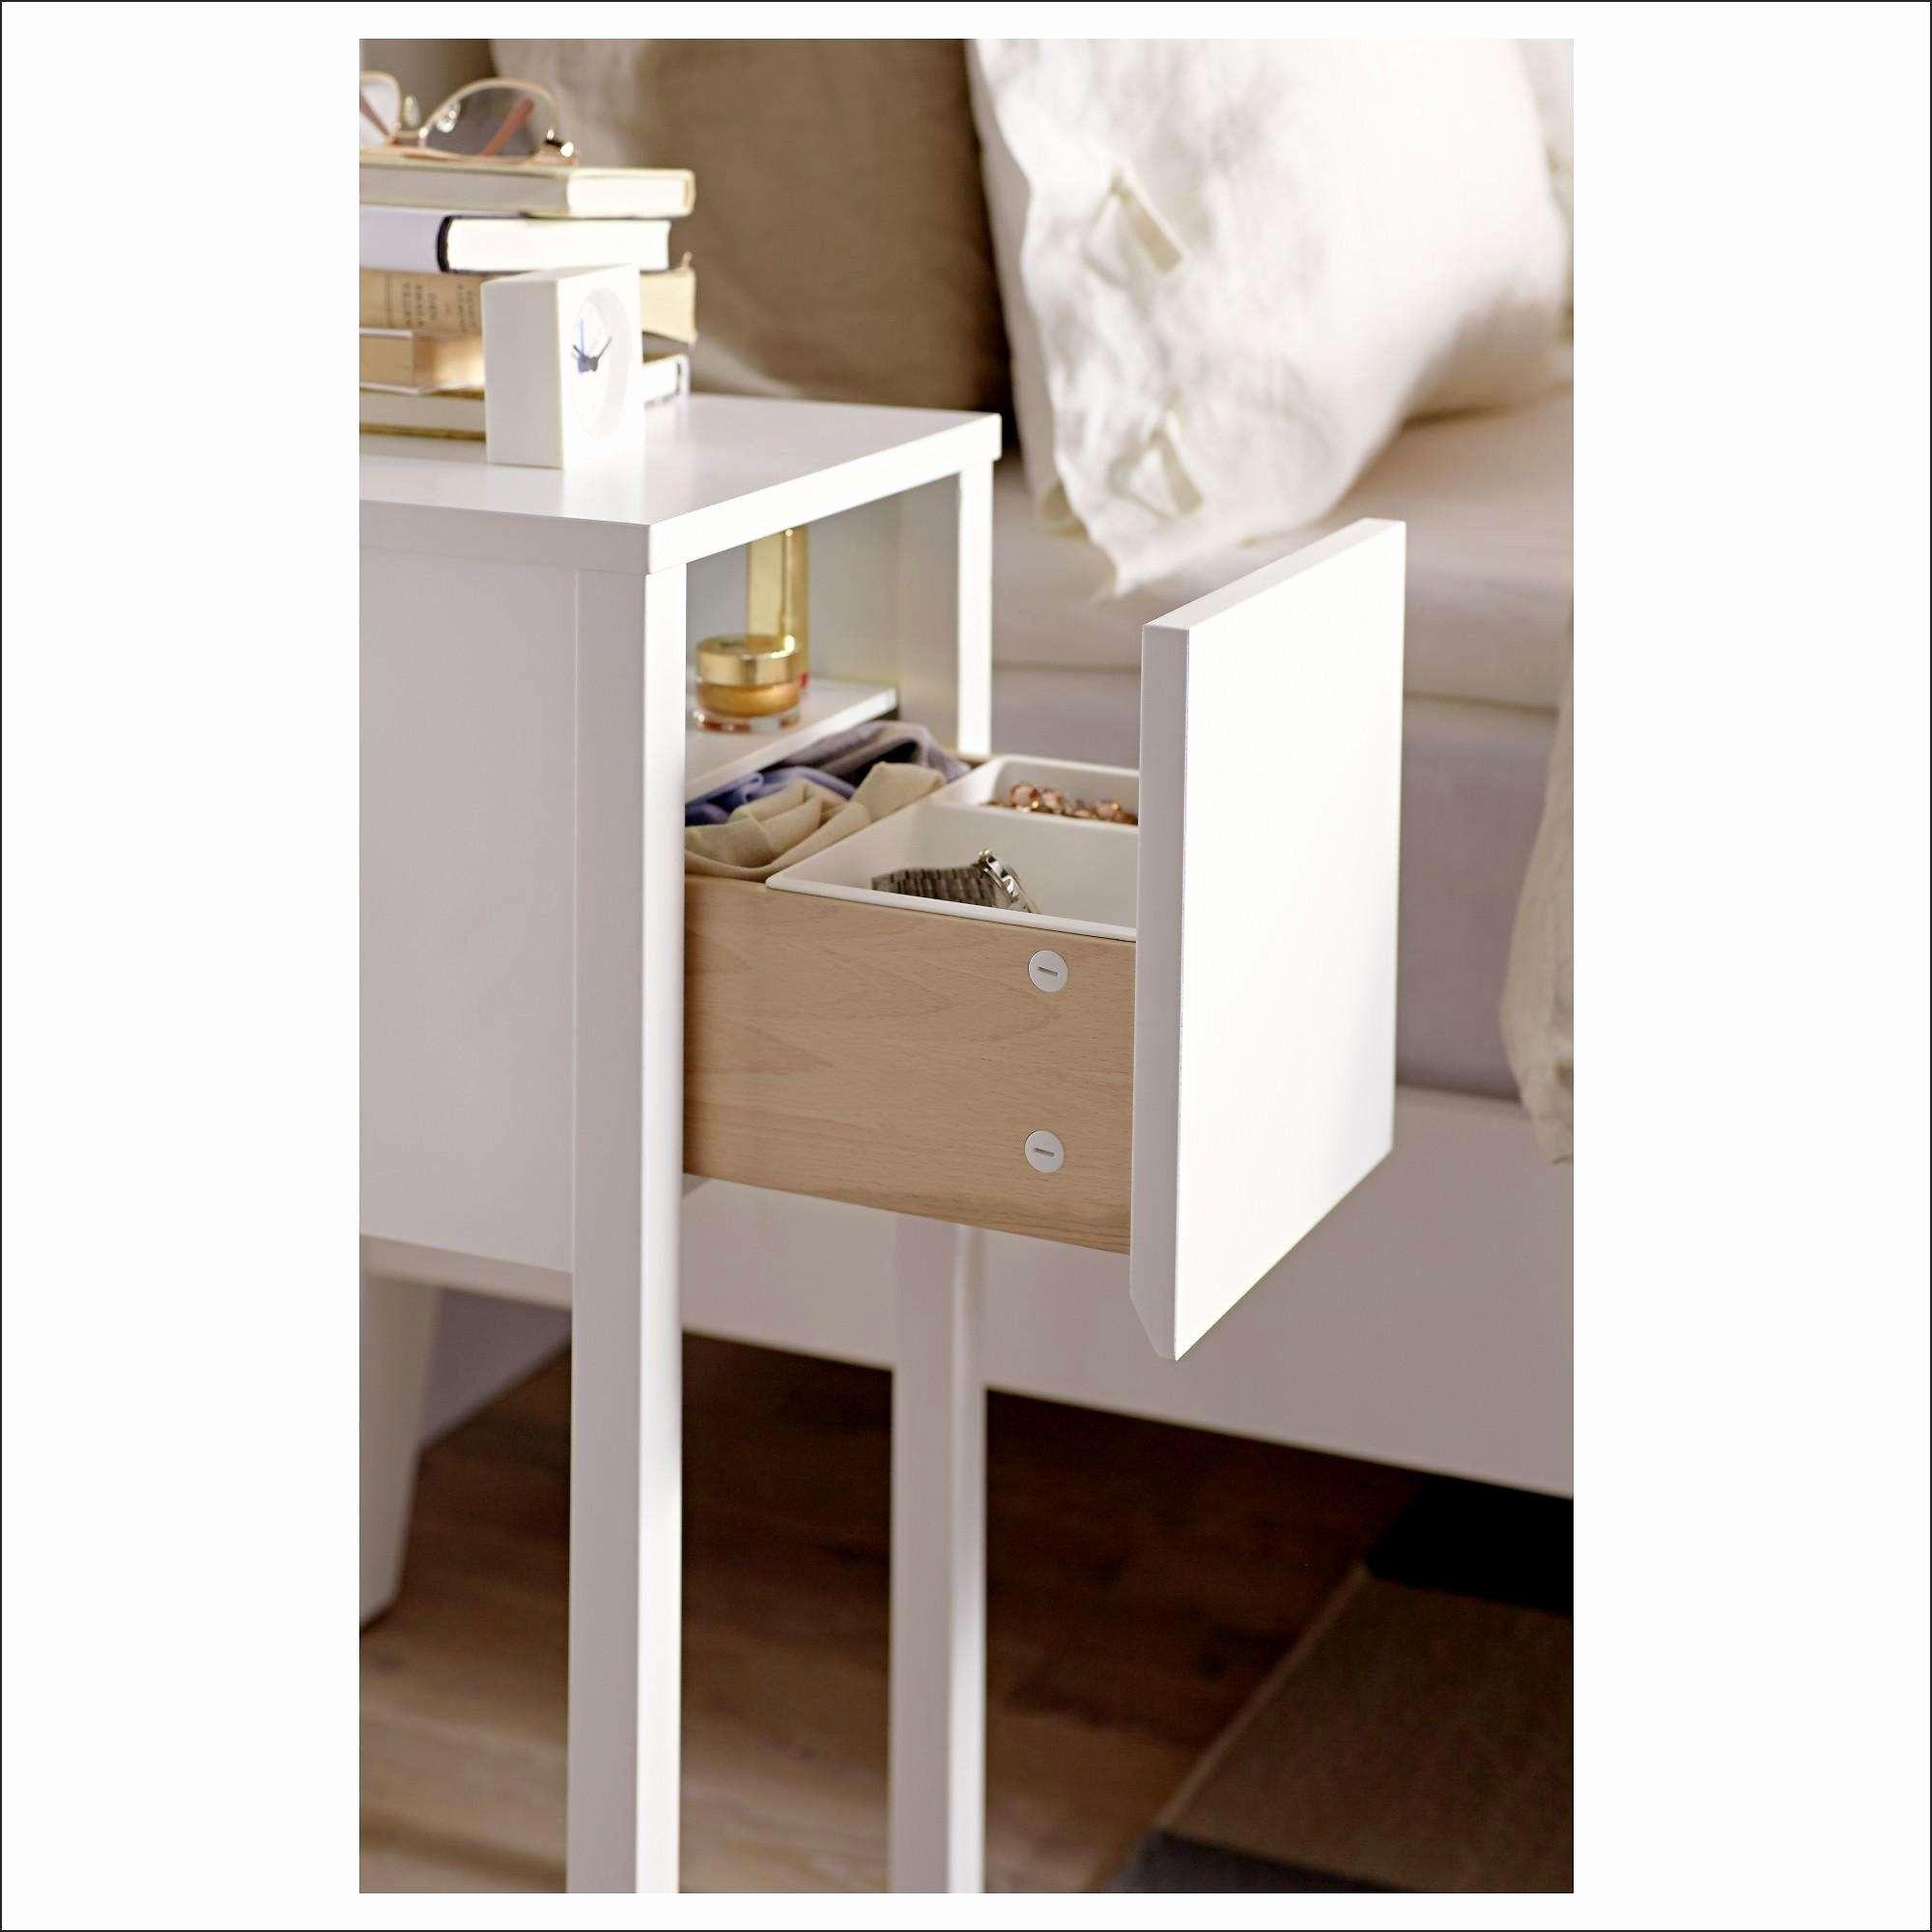 Fresh home goods nightstands bedside table ikea